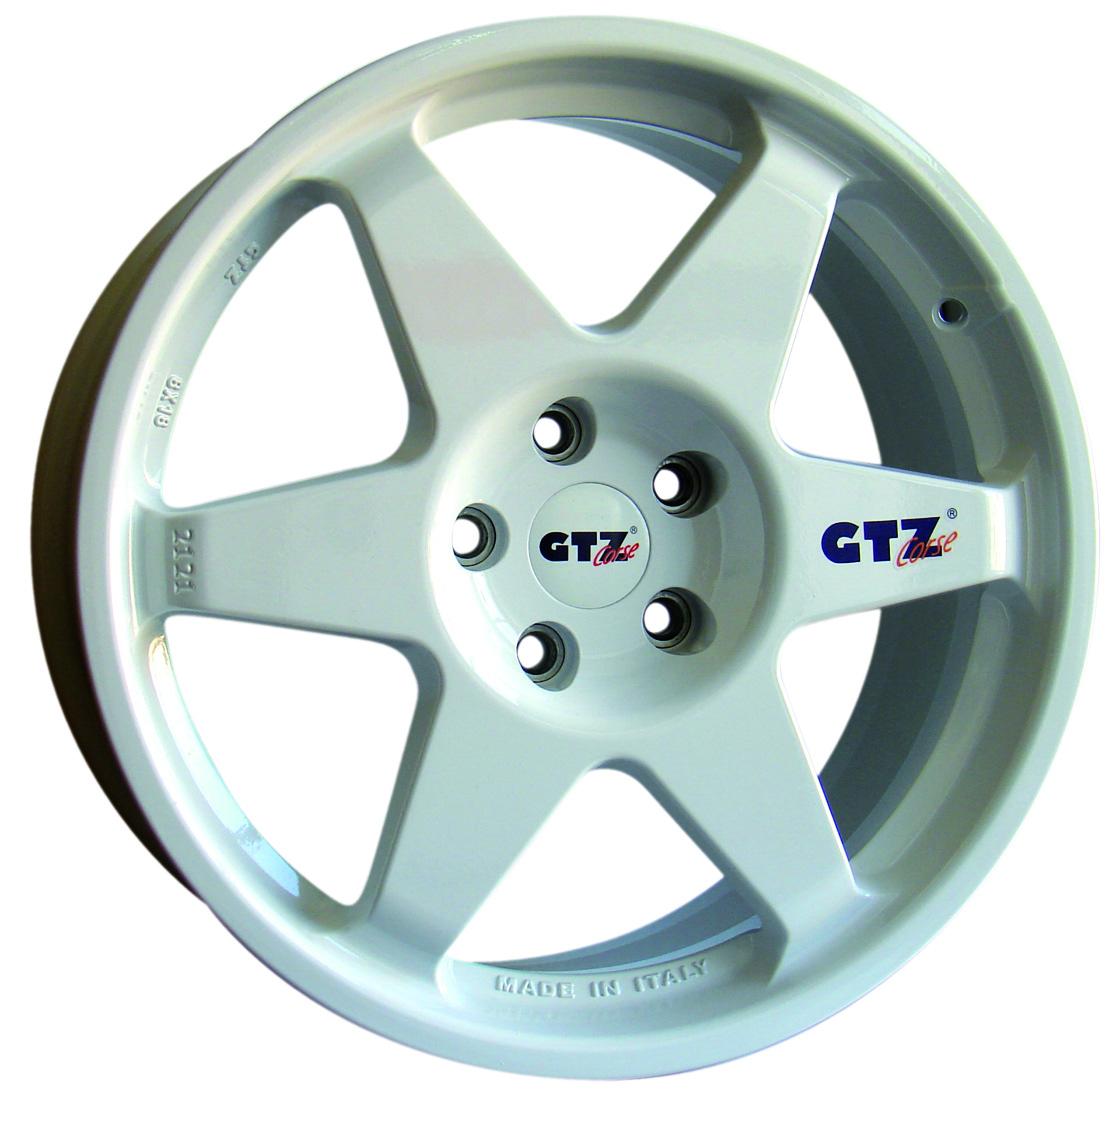 SPEEDLINE CORSE GTZ type 2121 8x18 5x112 ET42 WHITE